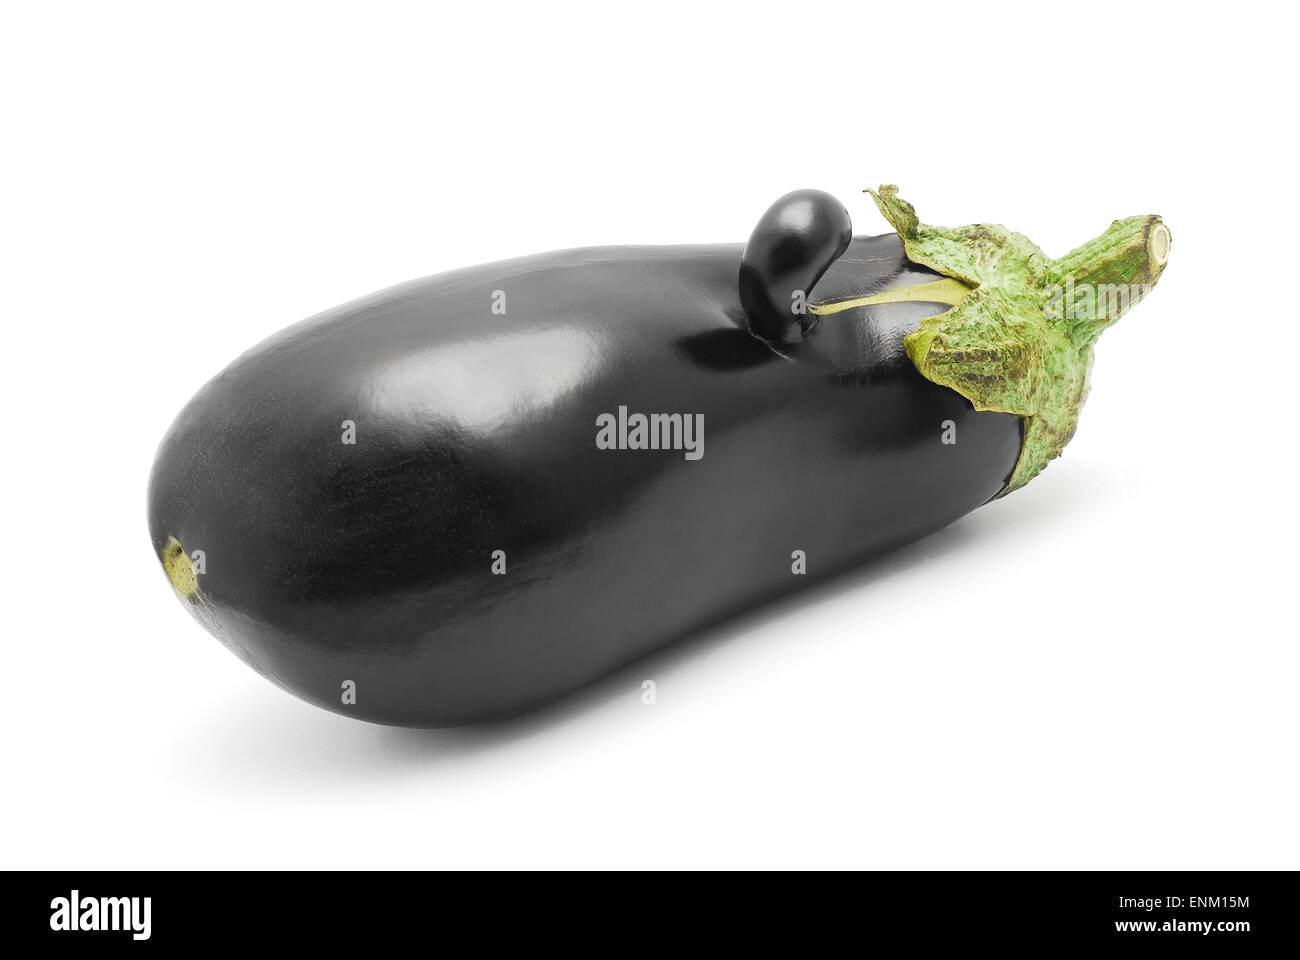 funny shaped egg plant on white - Stock Image